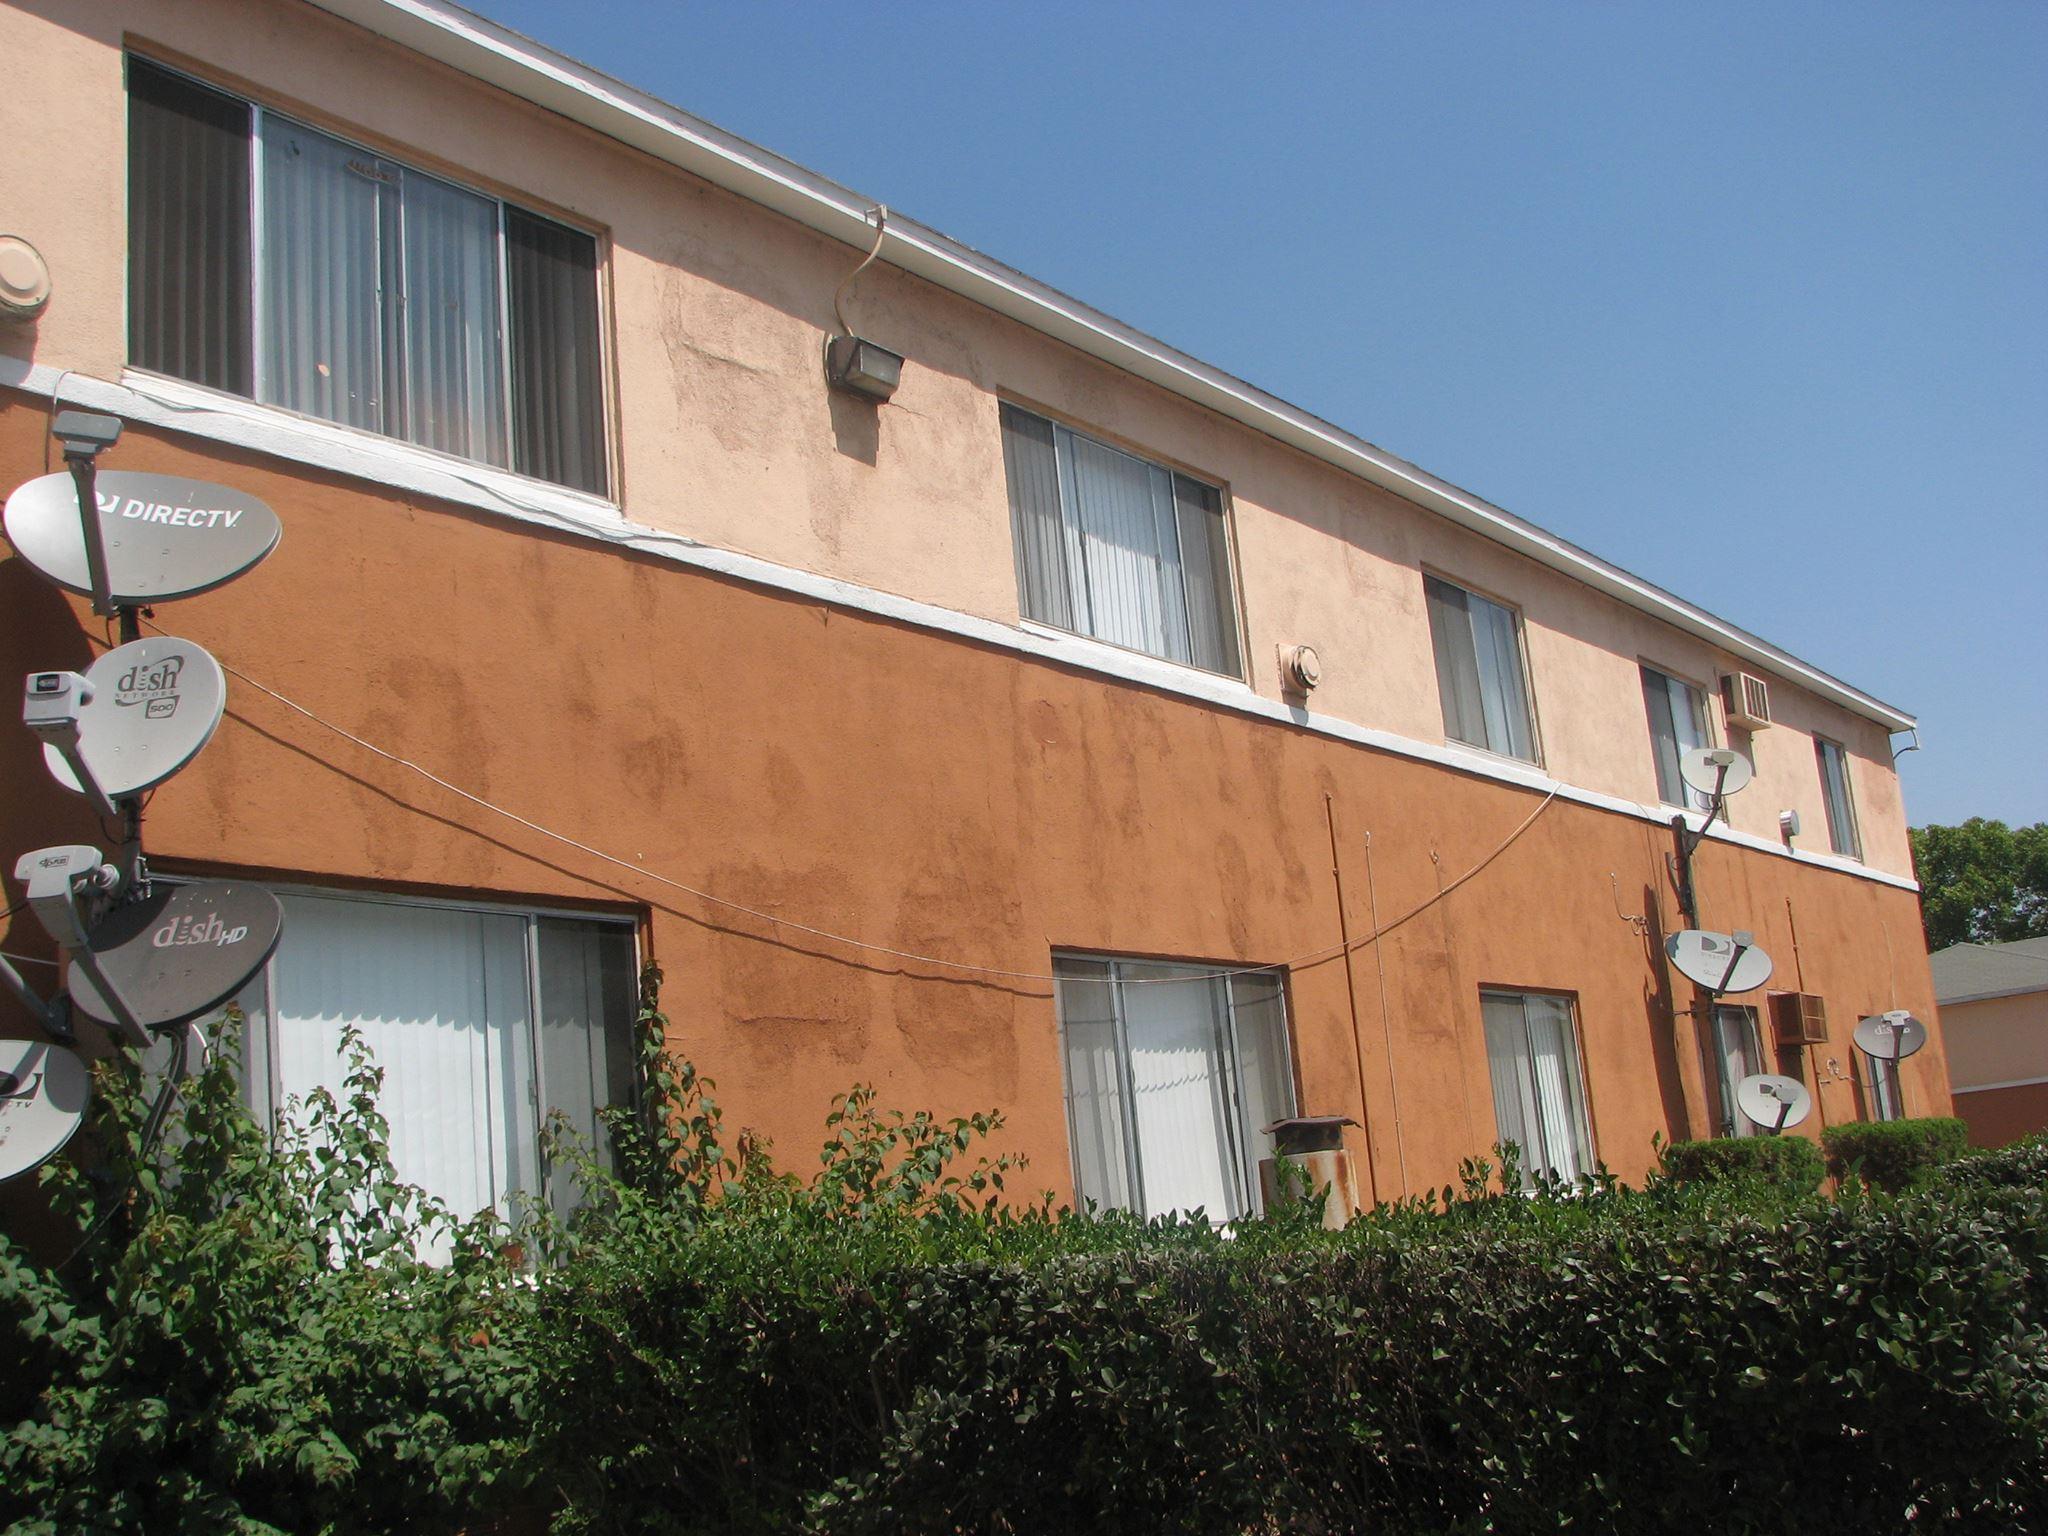 Wyvernwood Apartments, Los Angeles, California, United States